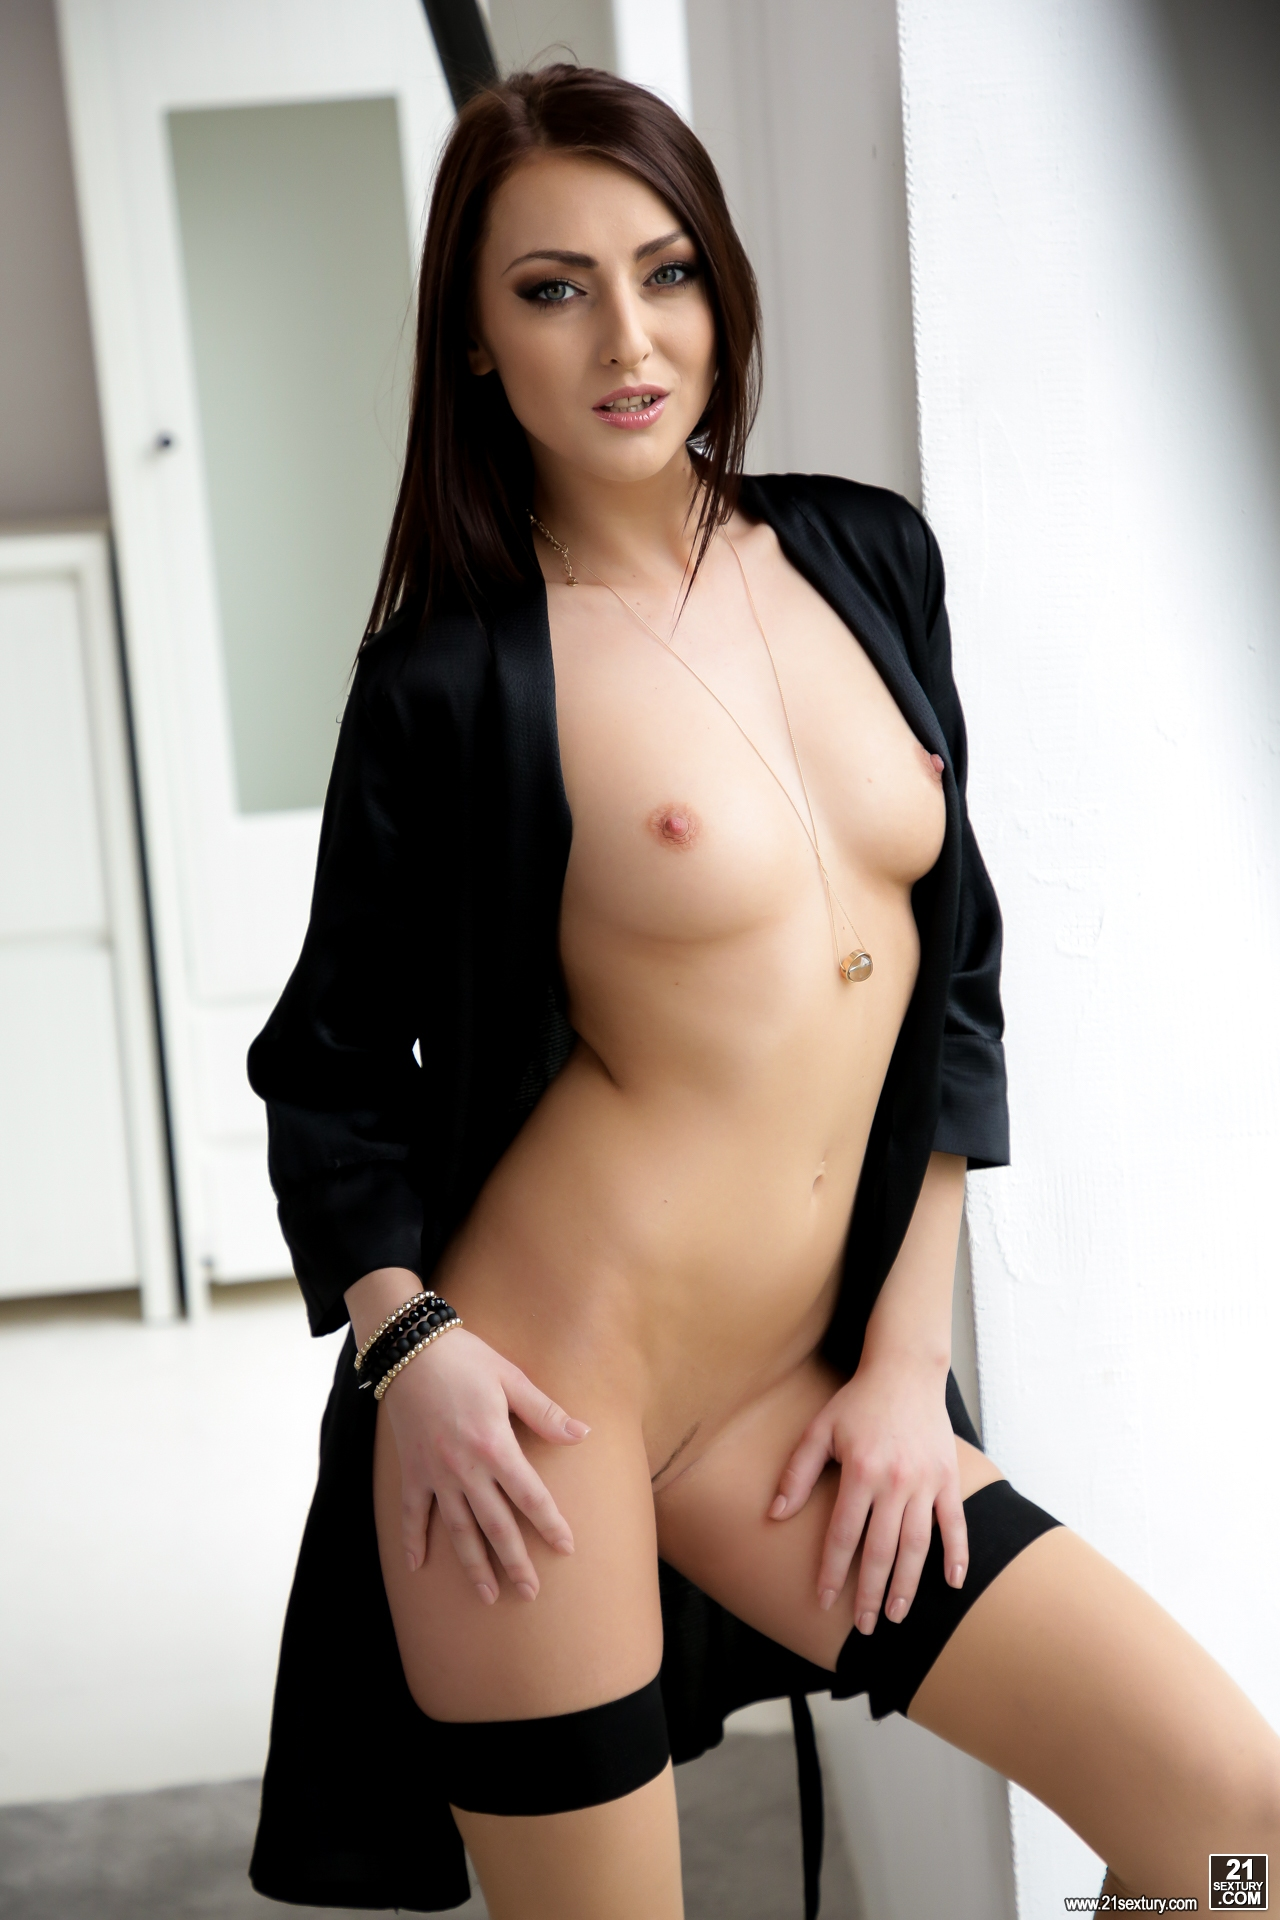 Katy rose nude